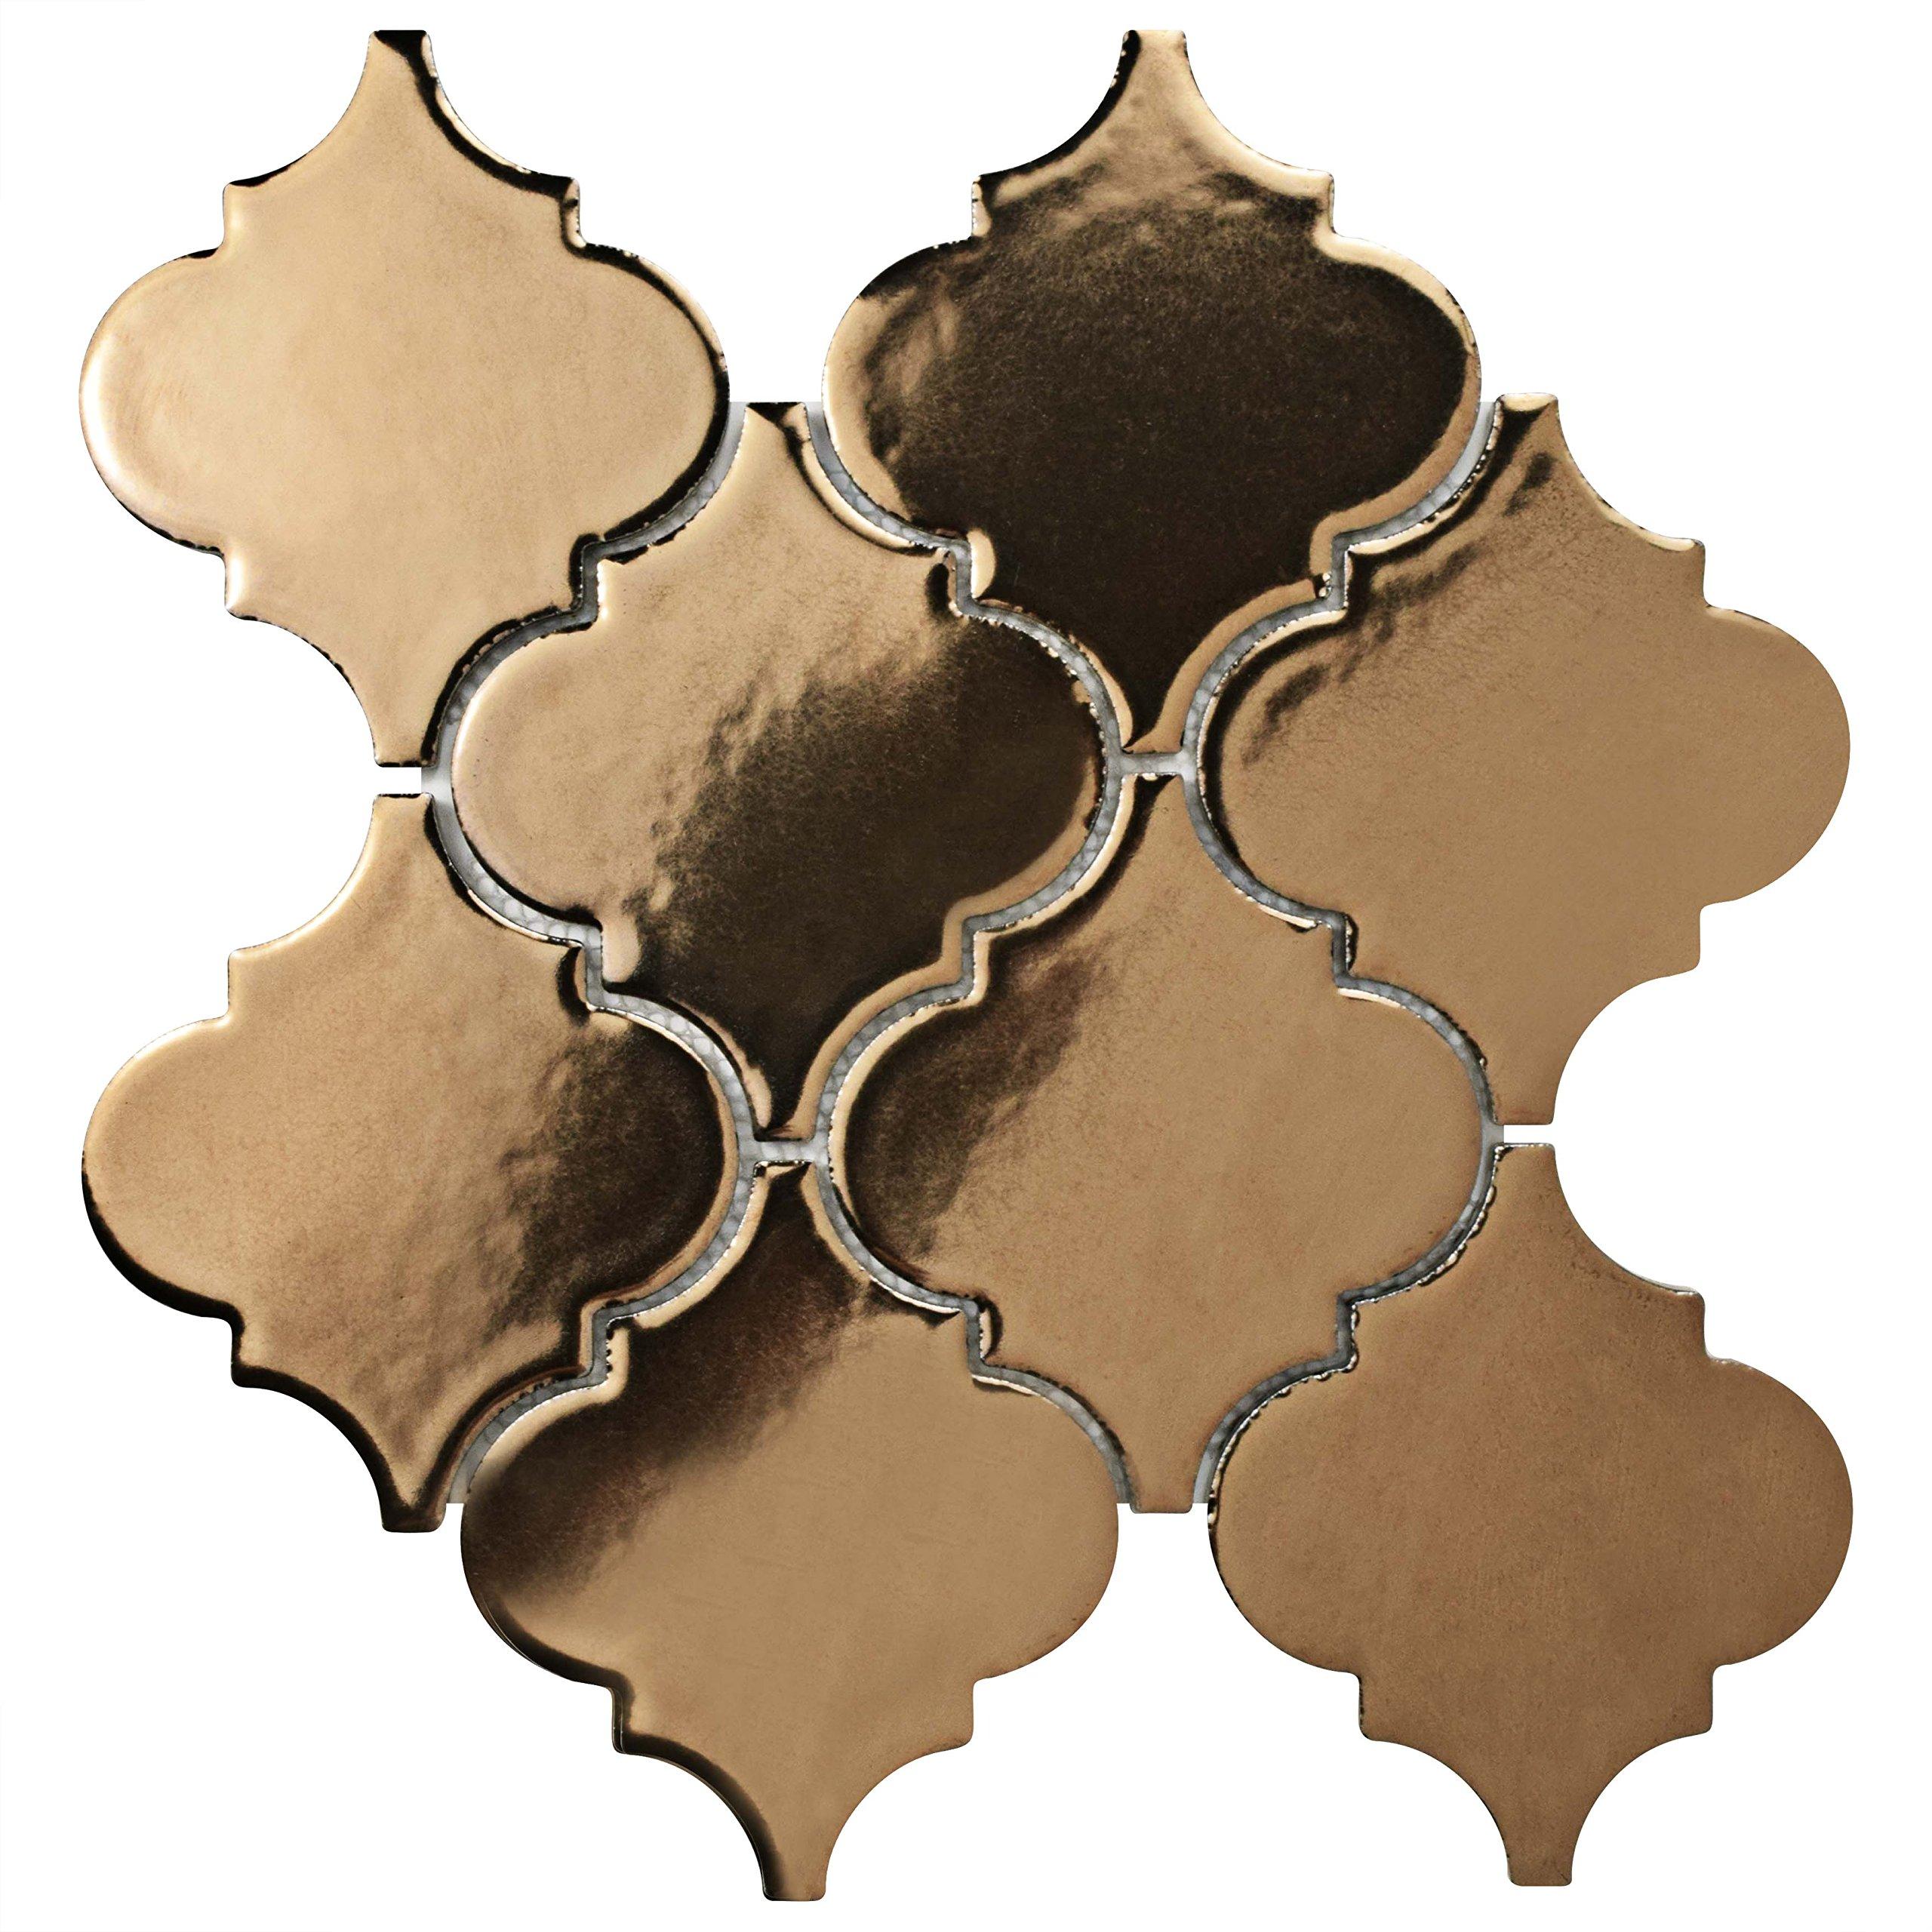 SomerTile FSDELTBB Essentia Lantern Porcelain Mosaic Floor and Wall Tile, 10.5'' x 10.5'', Burnished Bronze by SOMERTILE